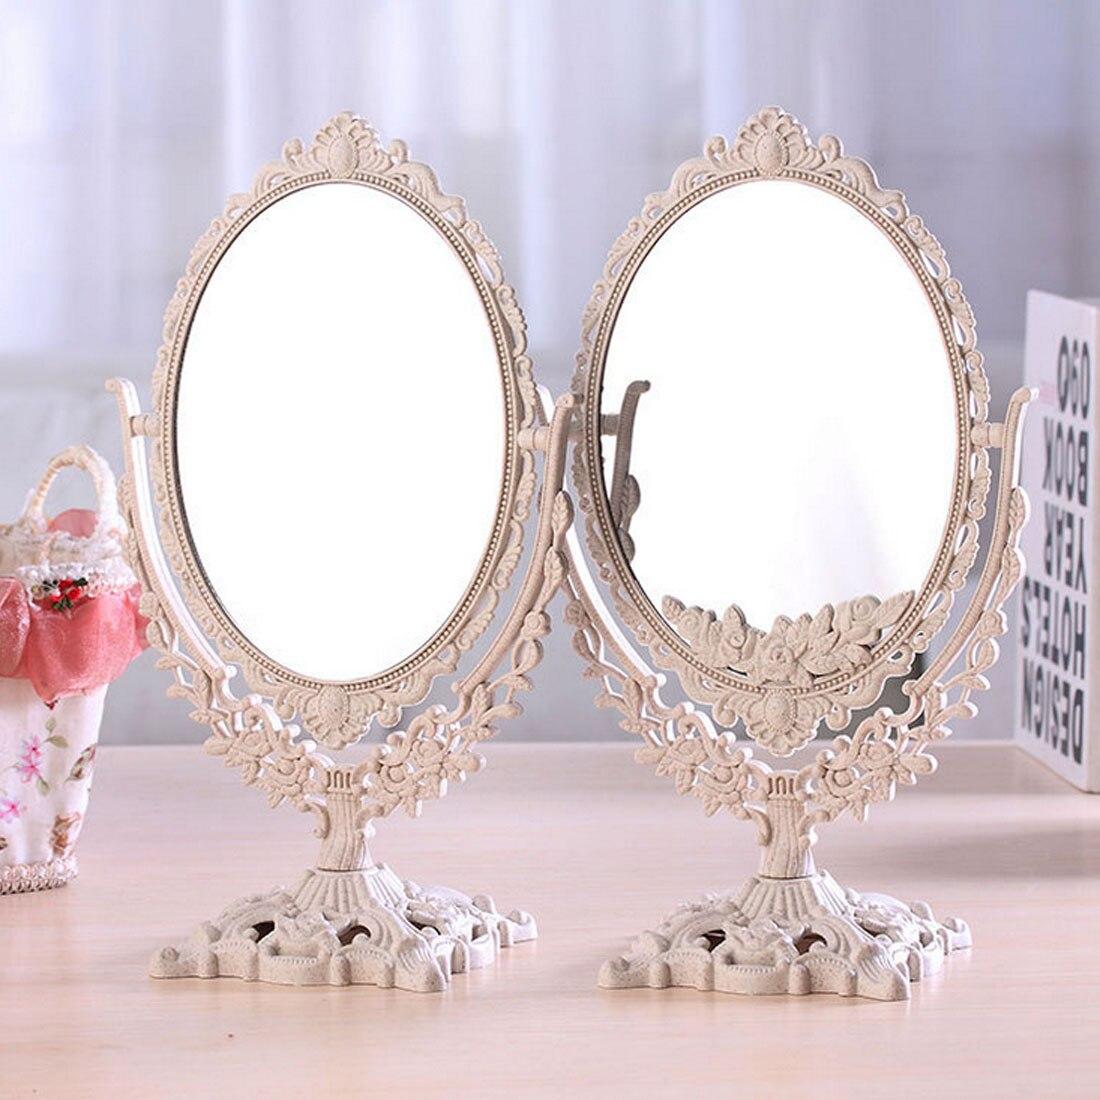 Girls Women Makeup Mirror Vintage Floral Oval Round Handhold Mirror Princess Elegant Makeup Beauty Tools European Retro Style